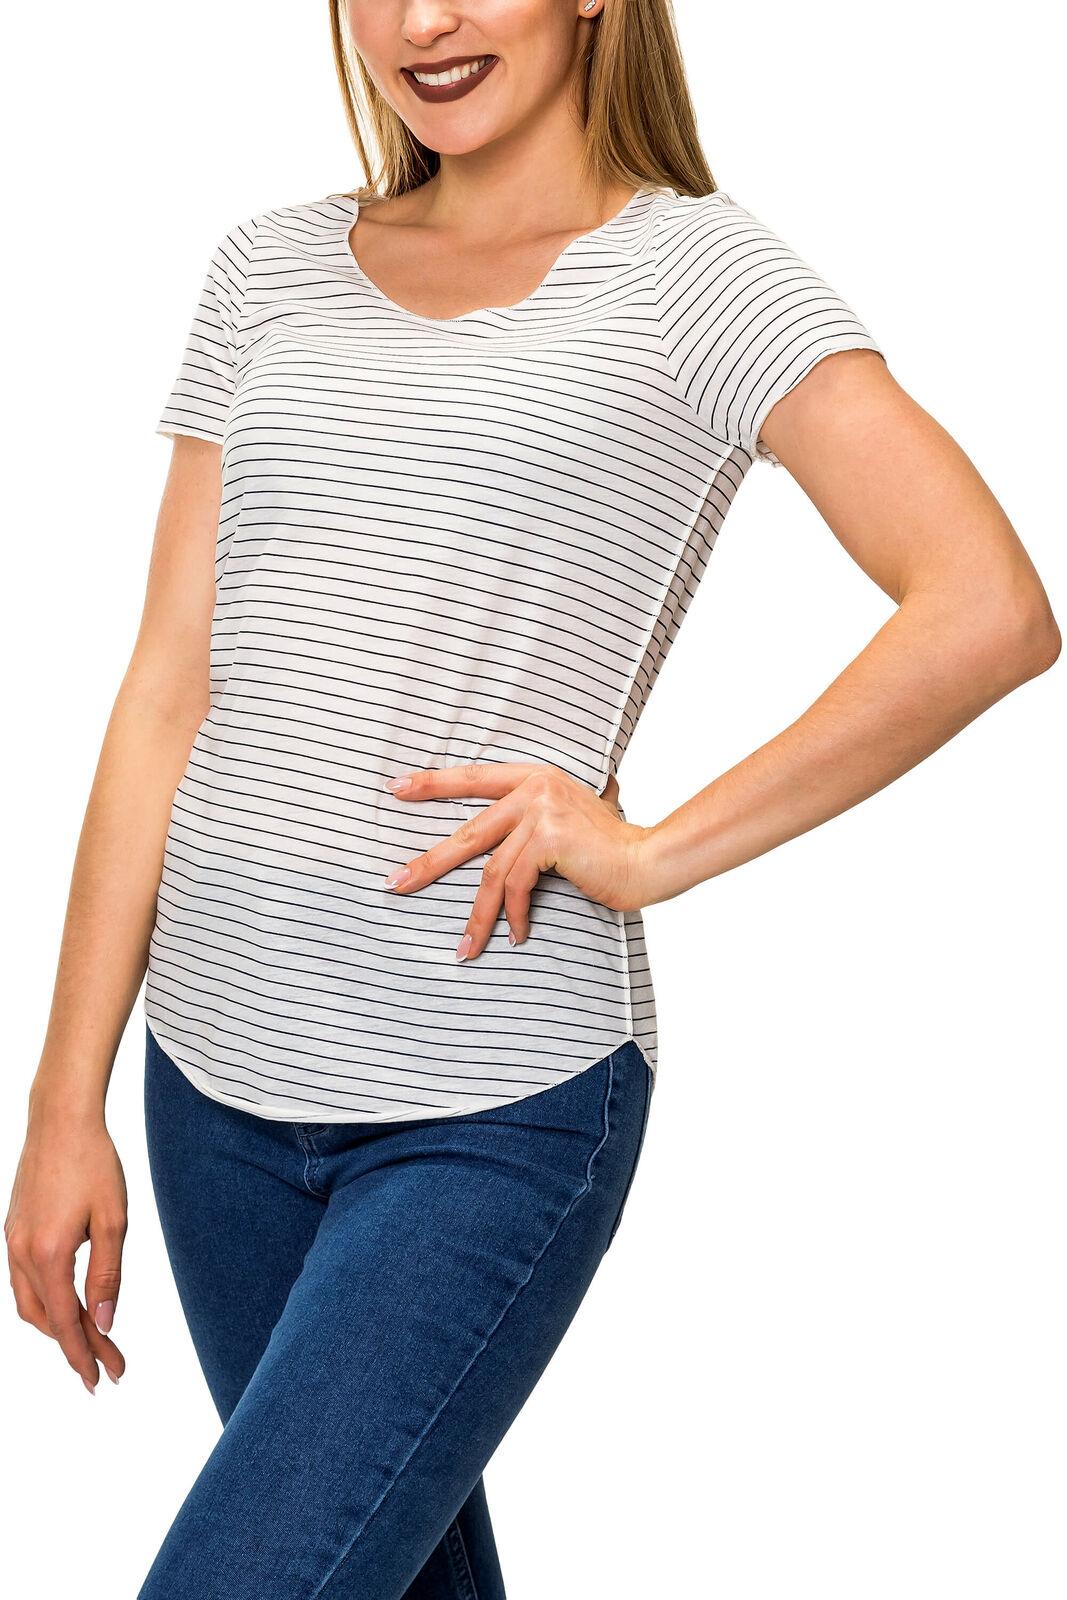 Vero Moda Damen T-Shirt Kurzarmshirt O-Neck Longshirt Stretch Comfy SALE %